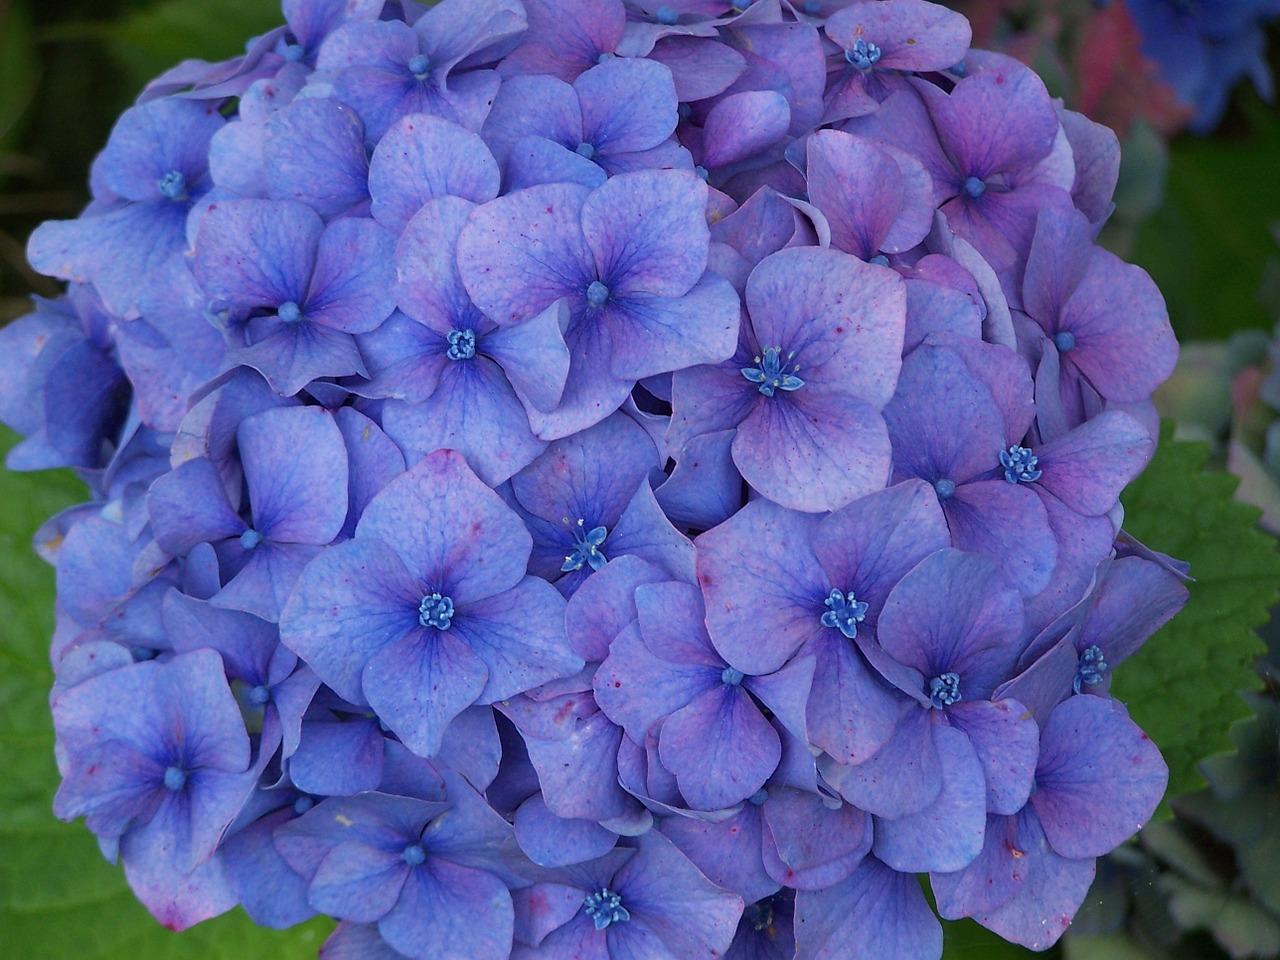 Hydrangeablueflowerbrittanyblue Flowers Free Photo From